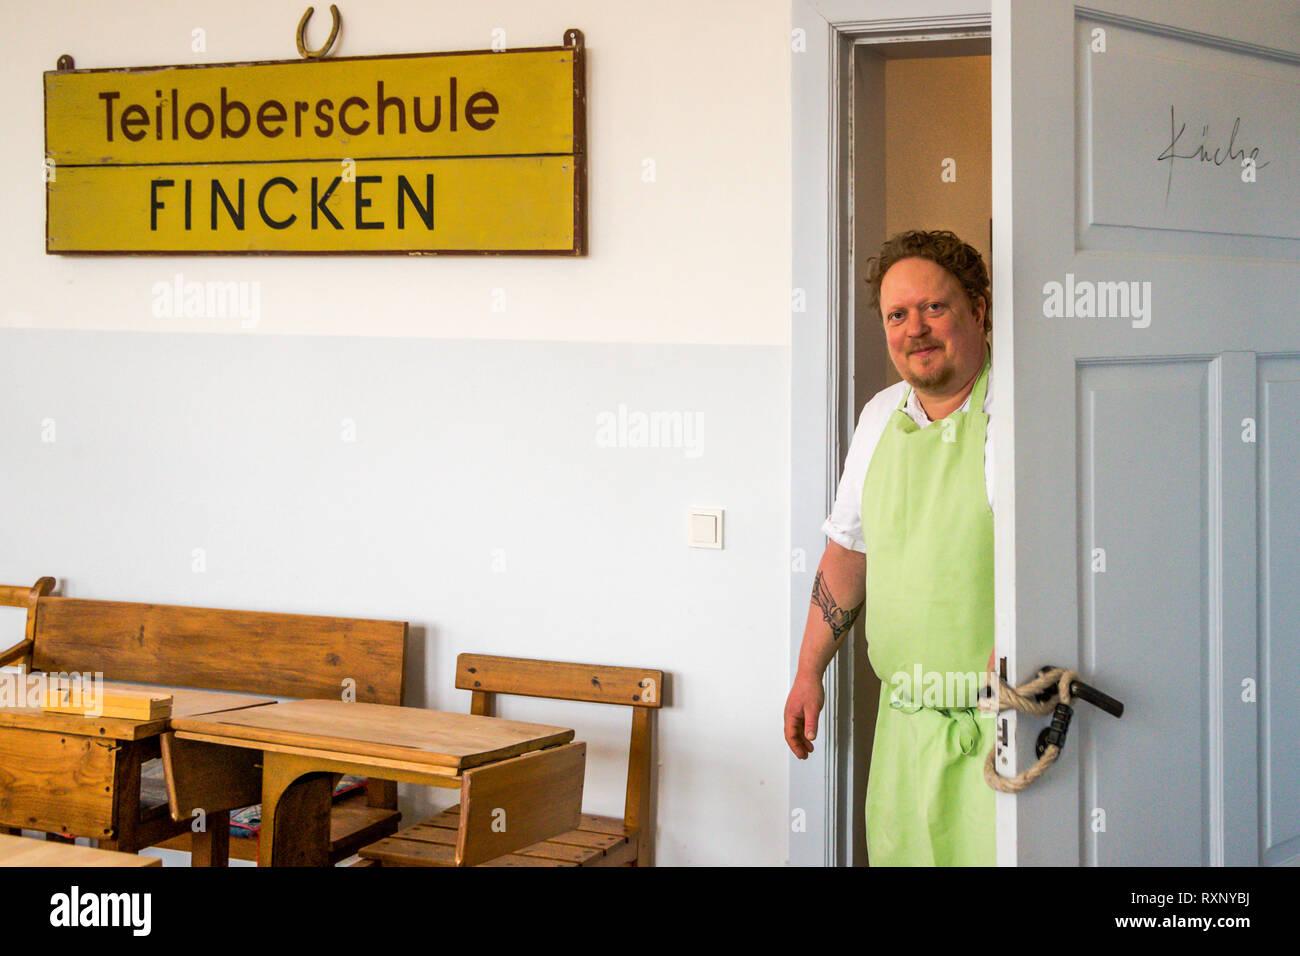 Gunnar Müller, chef of Hotel Kavaliershaus in Fincken, Germany Stock Photo